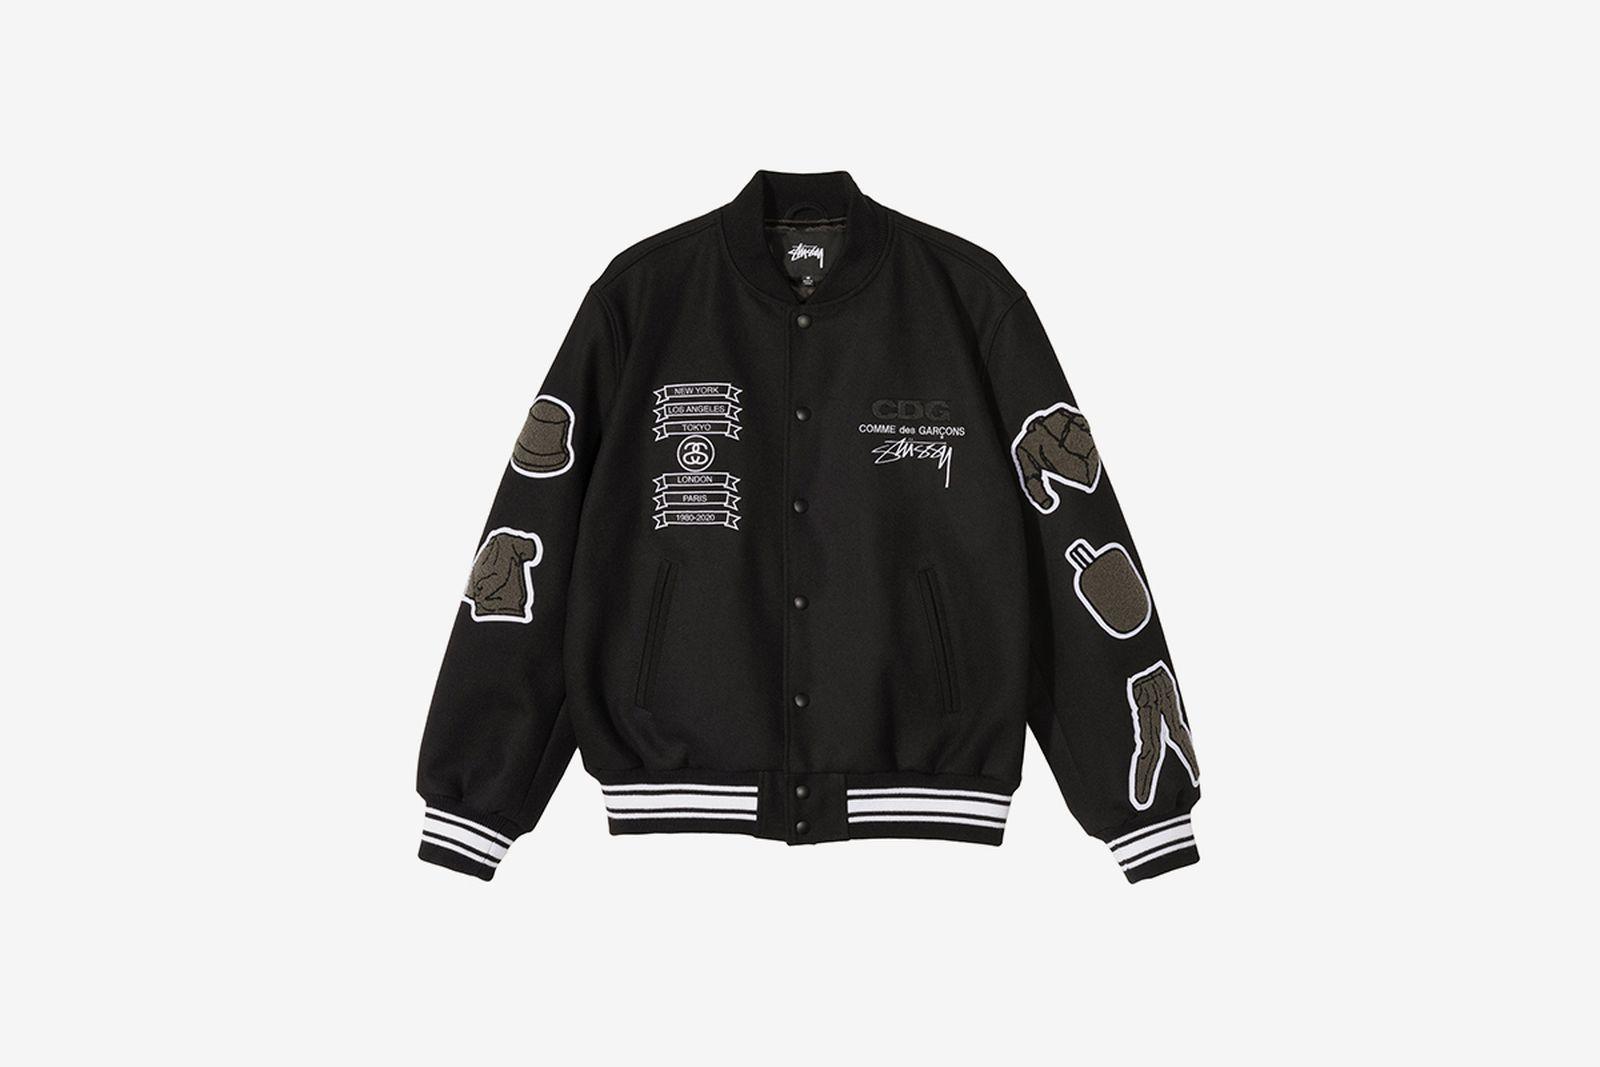 stussy-comme-des-garcons-varsity-jacket-1-01